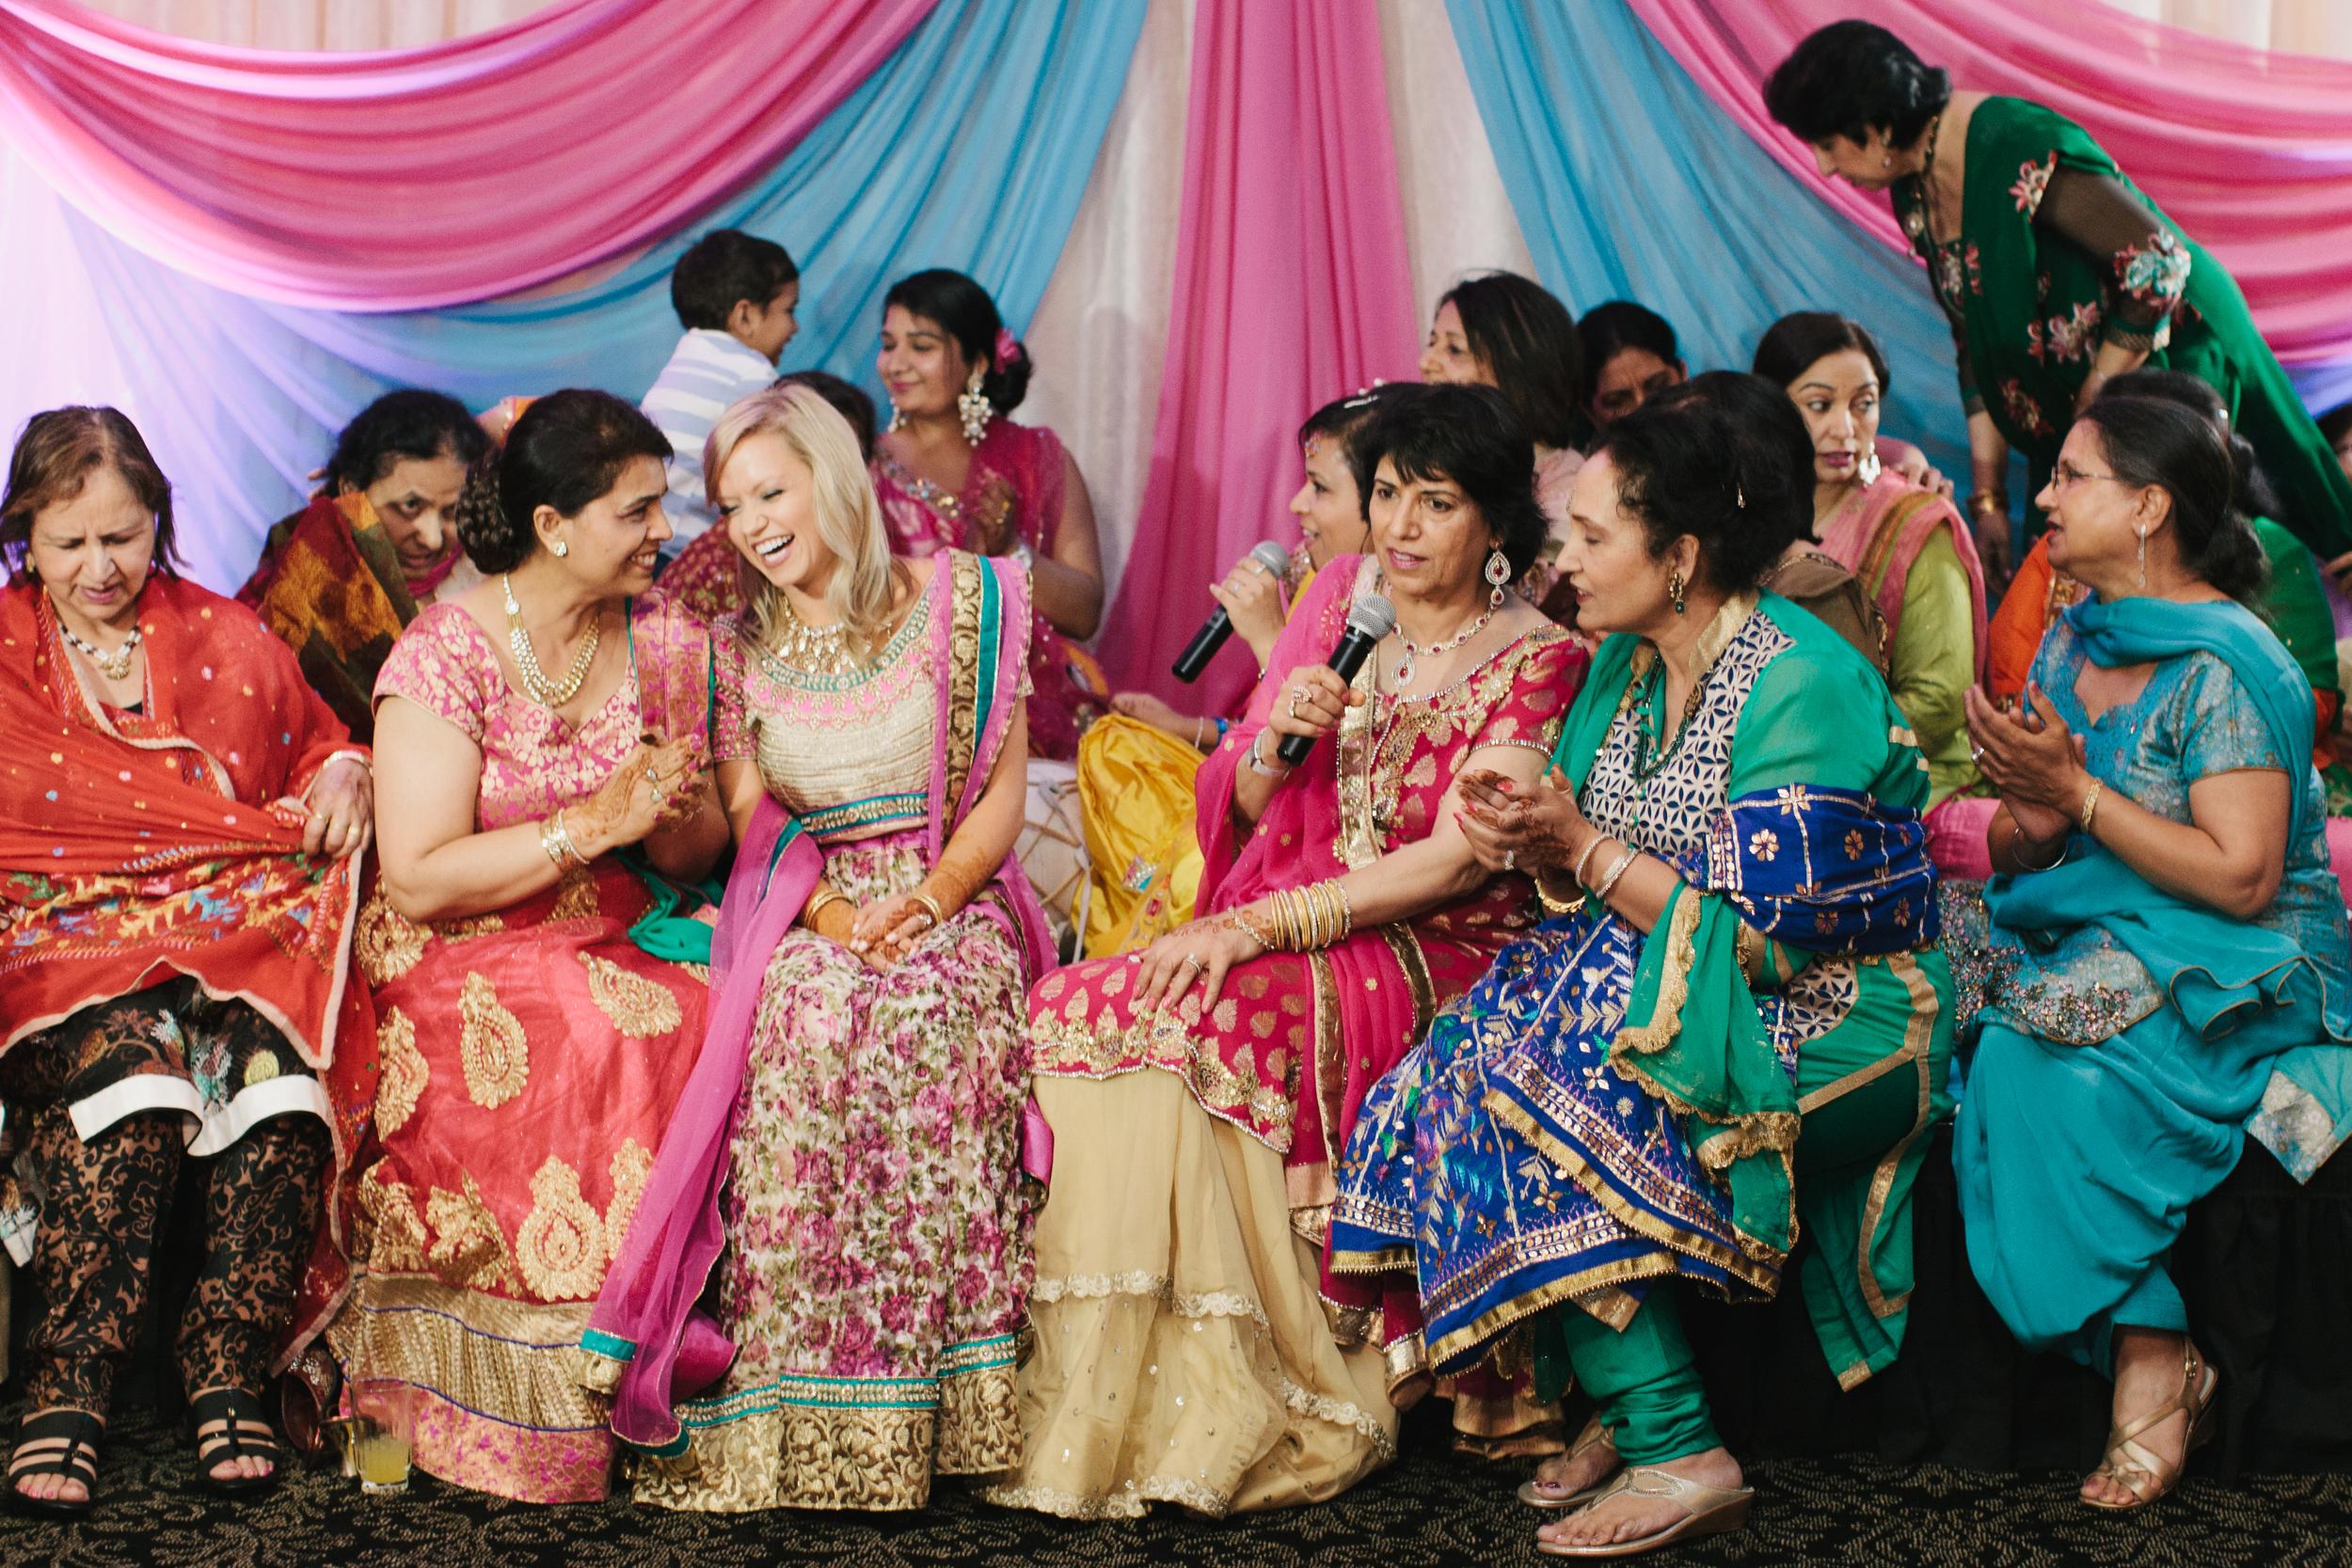 Detroit Michigan Sikh Wedding Photographer Mae Stier-062.jpg